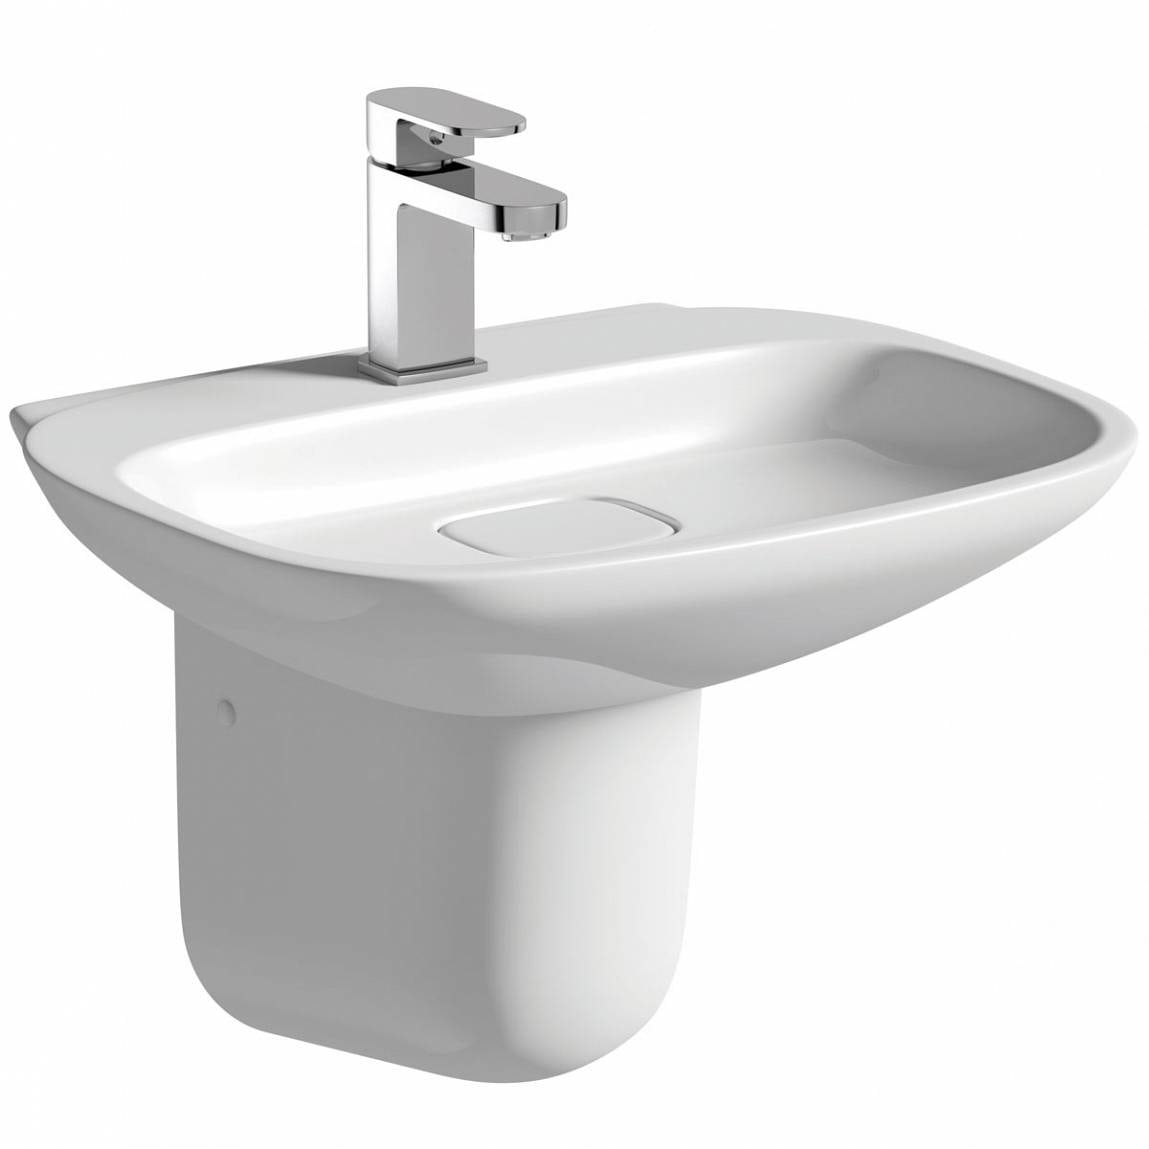 Mode Heath 1 tap hole semi pedestal basin 500mm with waste